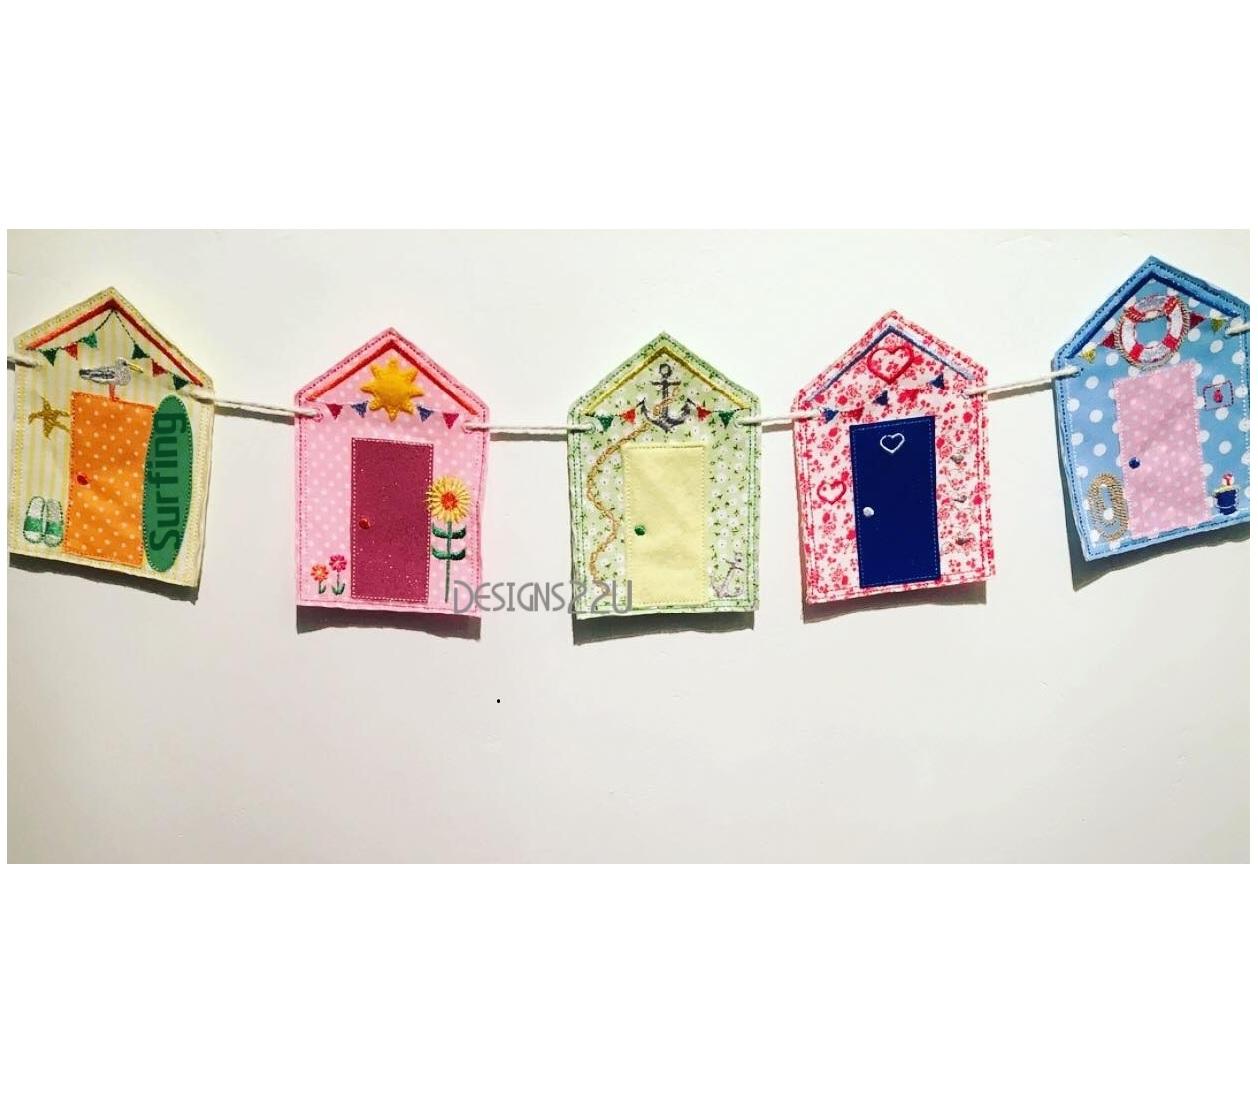 Beach Hut Machine Embroidery Design: Beach Hut Bunting Embroidery Design